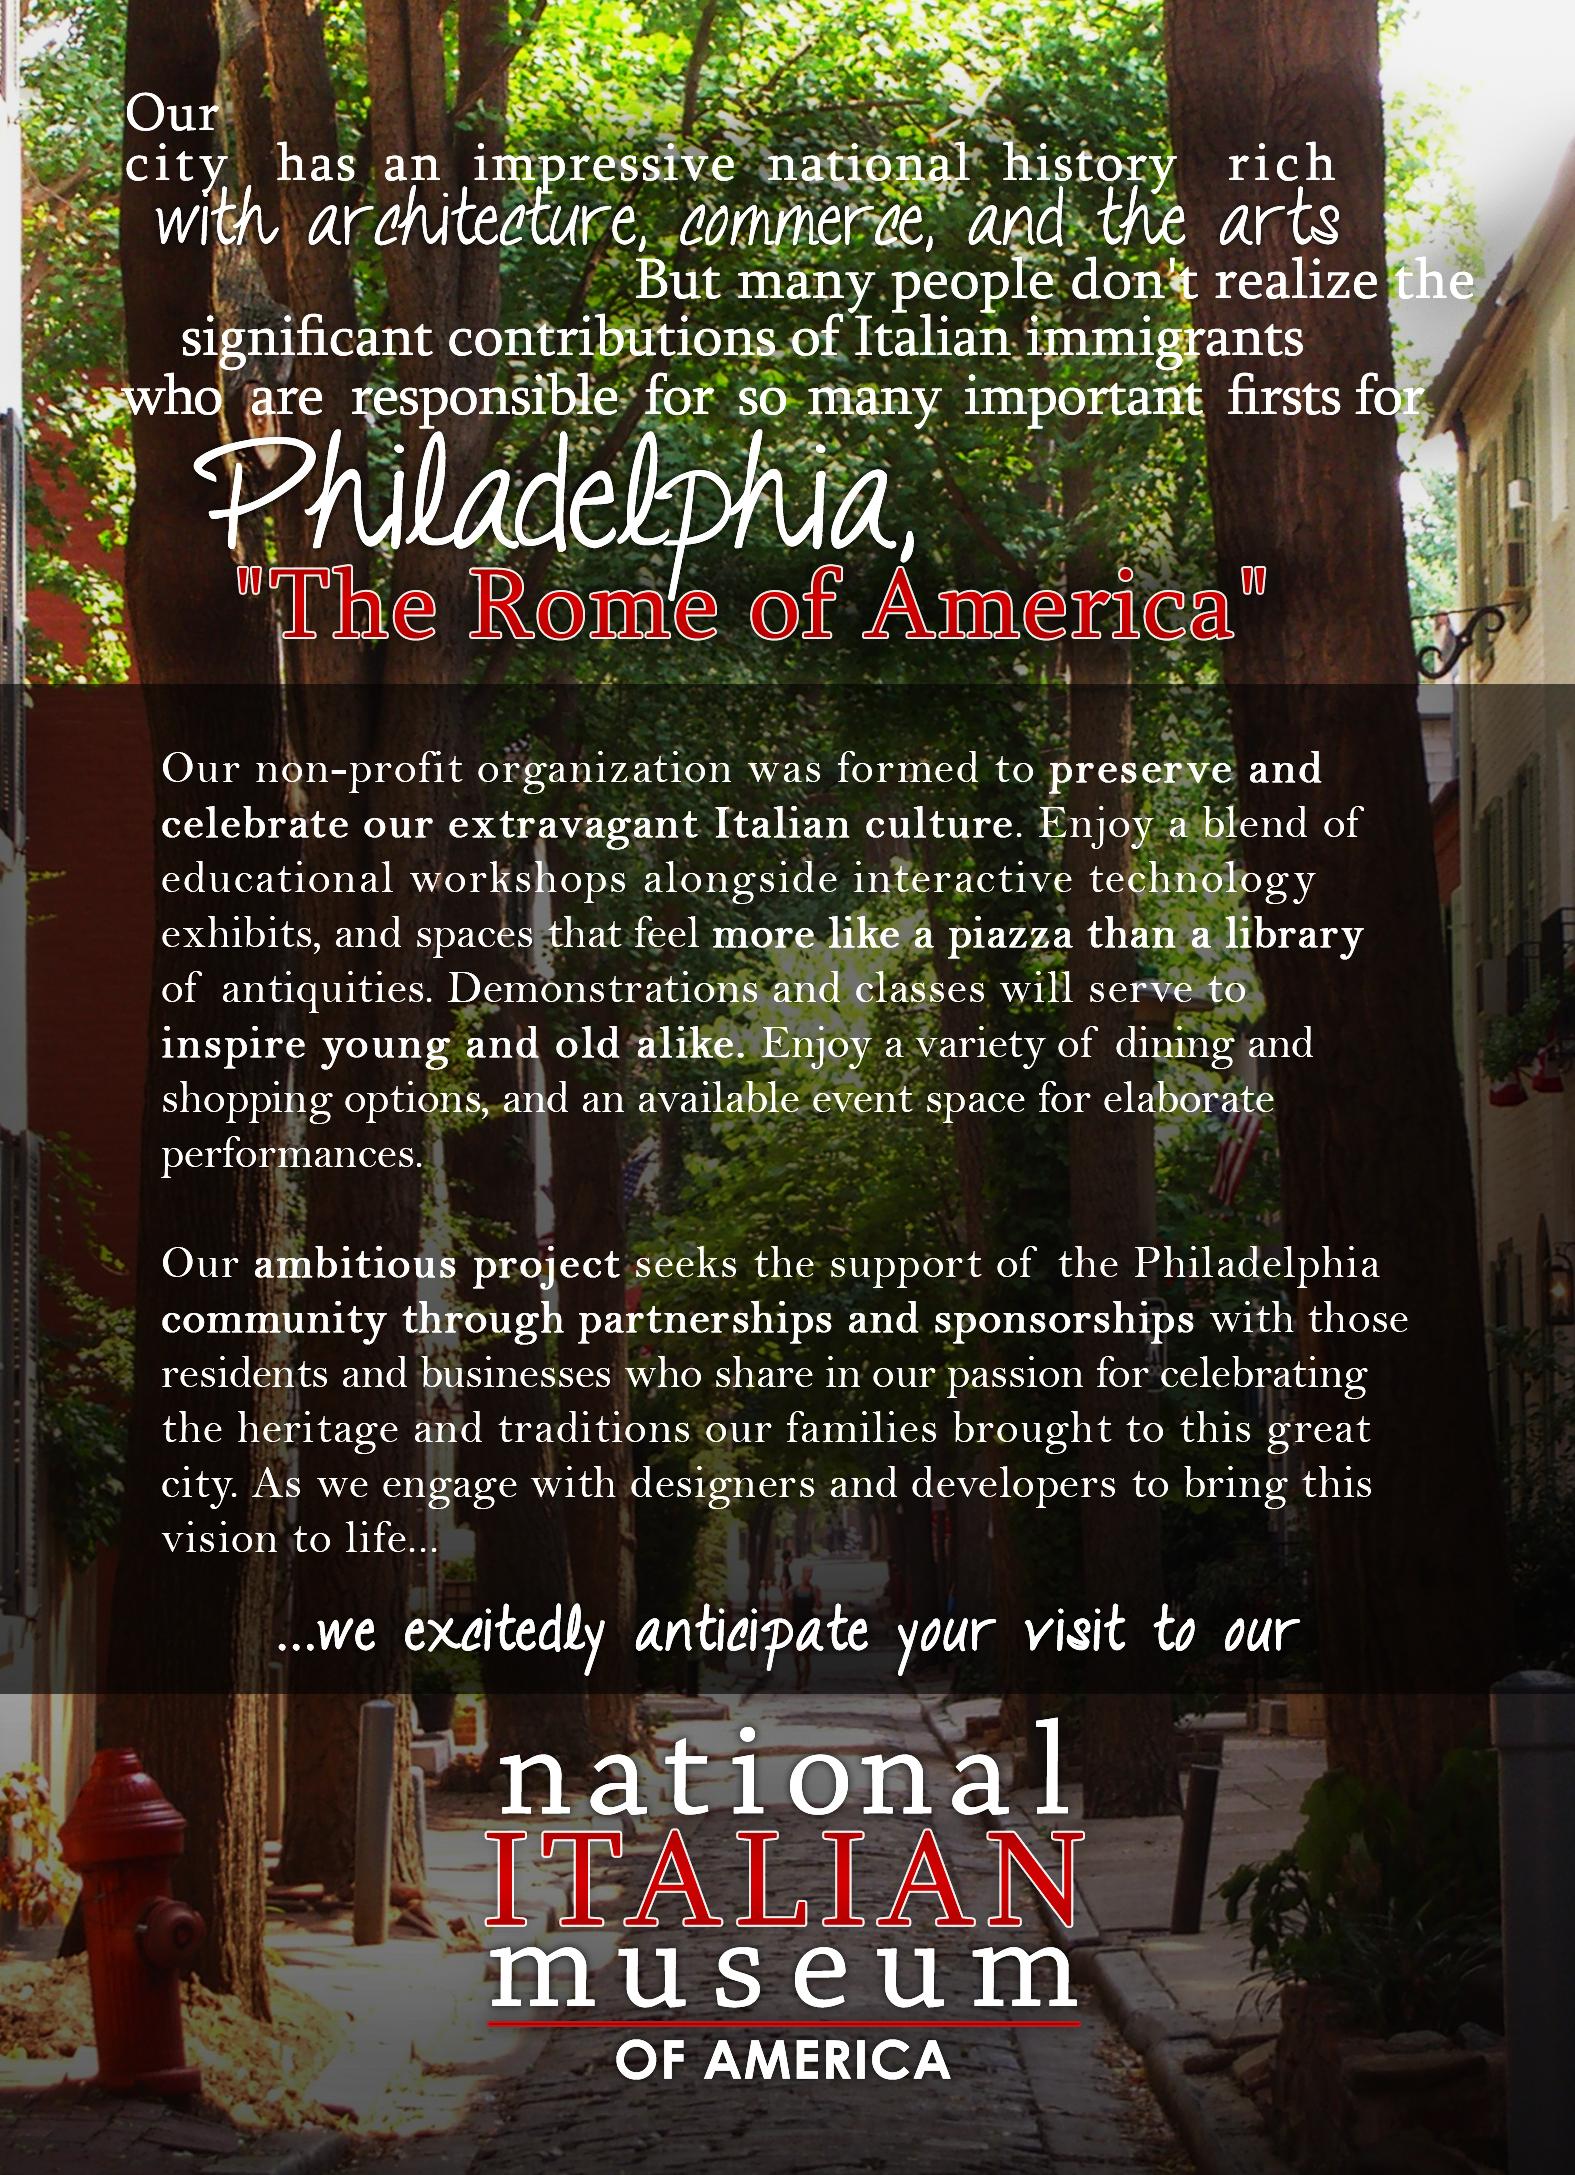 National Italian Museum of America - Poster for Interest